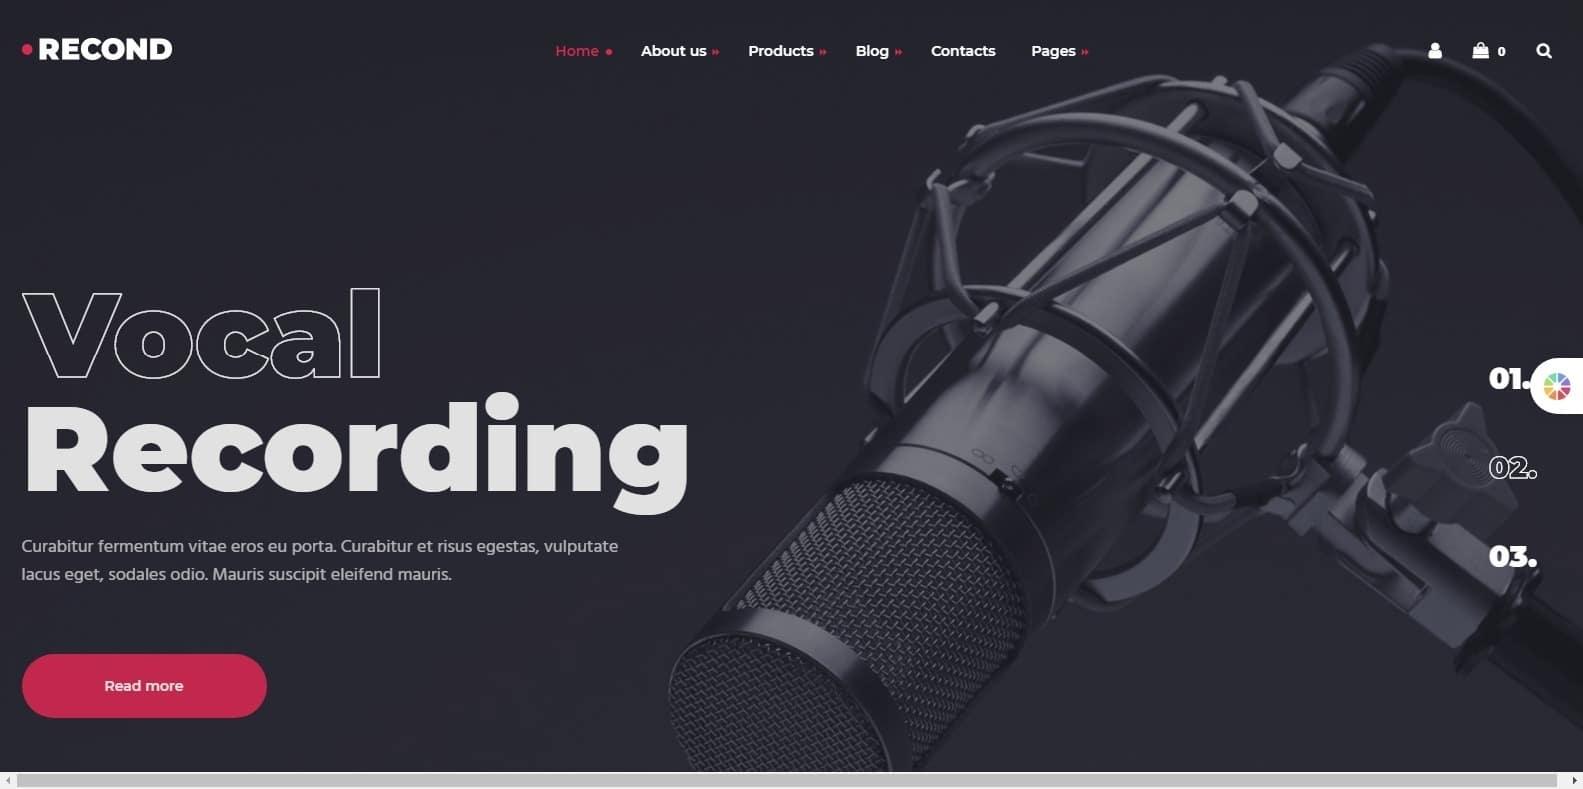 recond-recording-studio-website-template